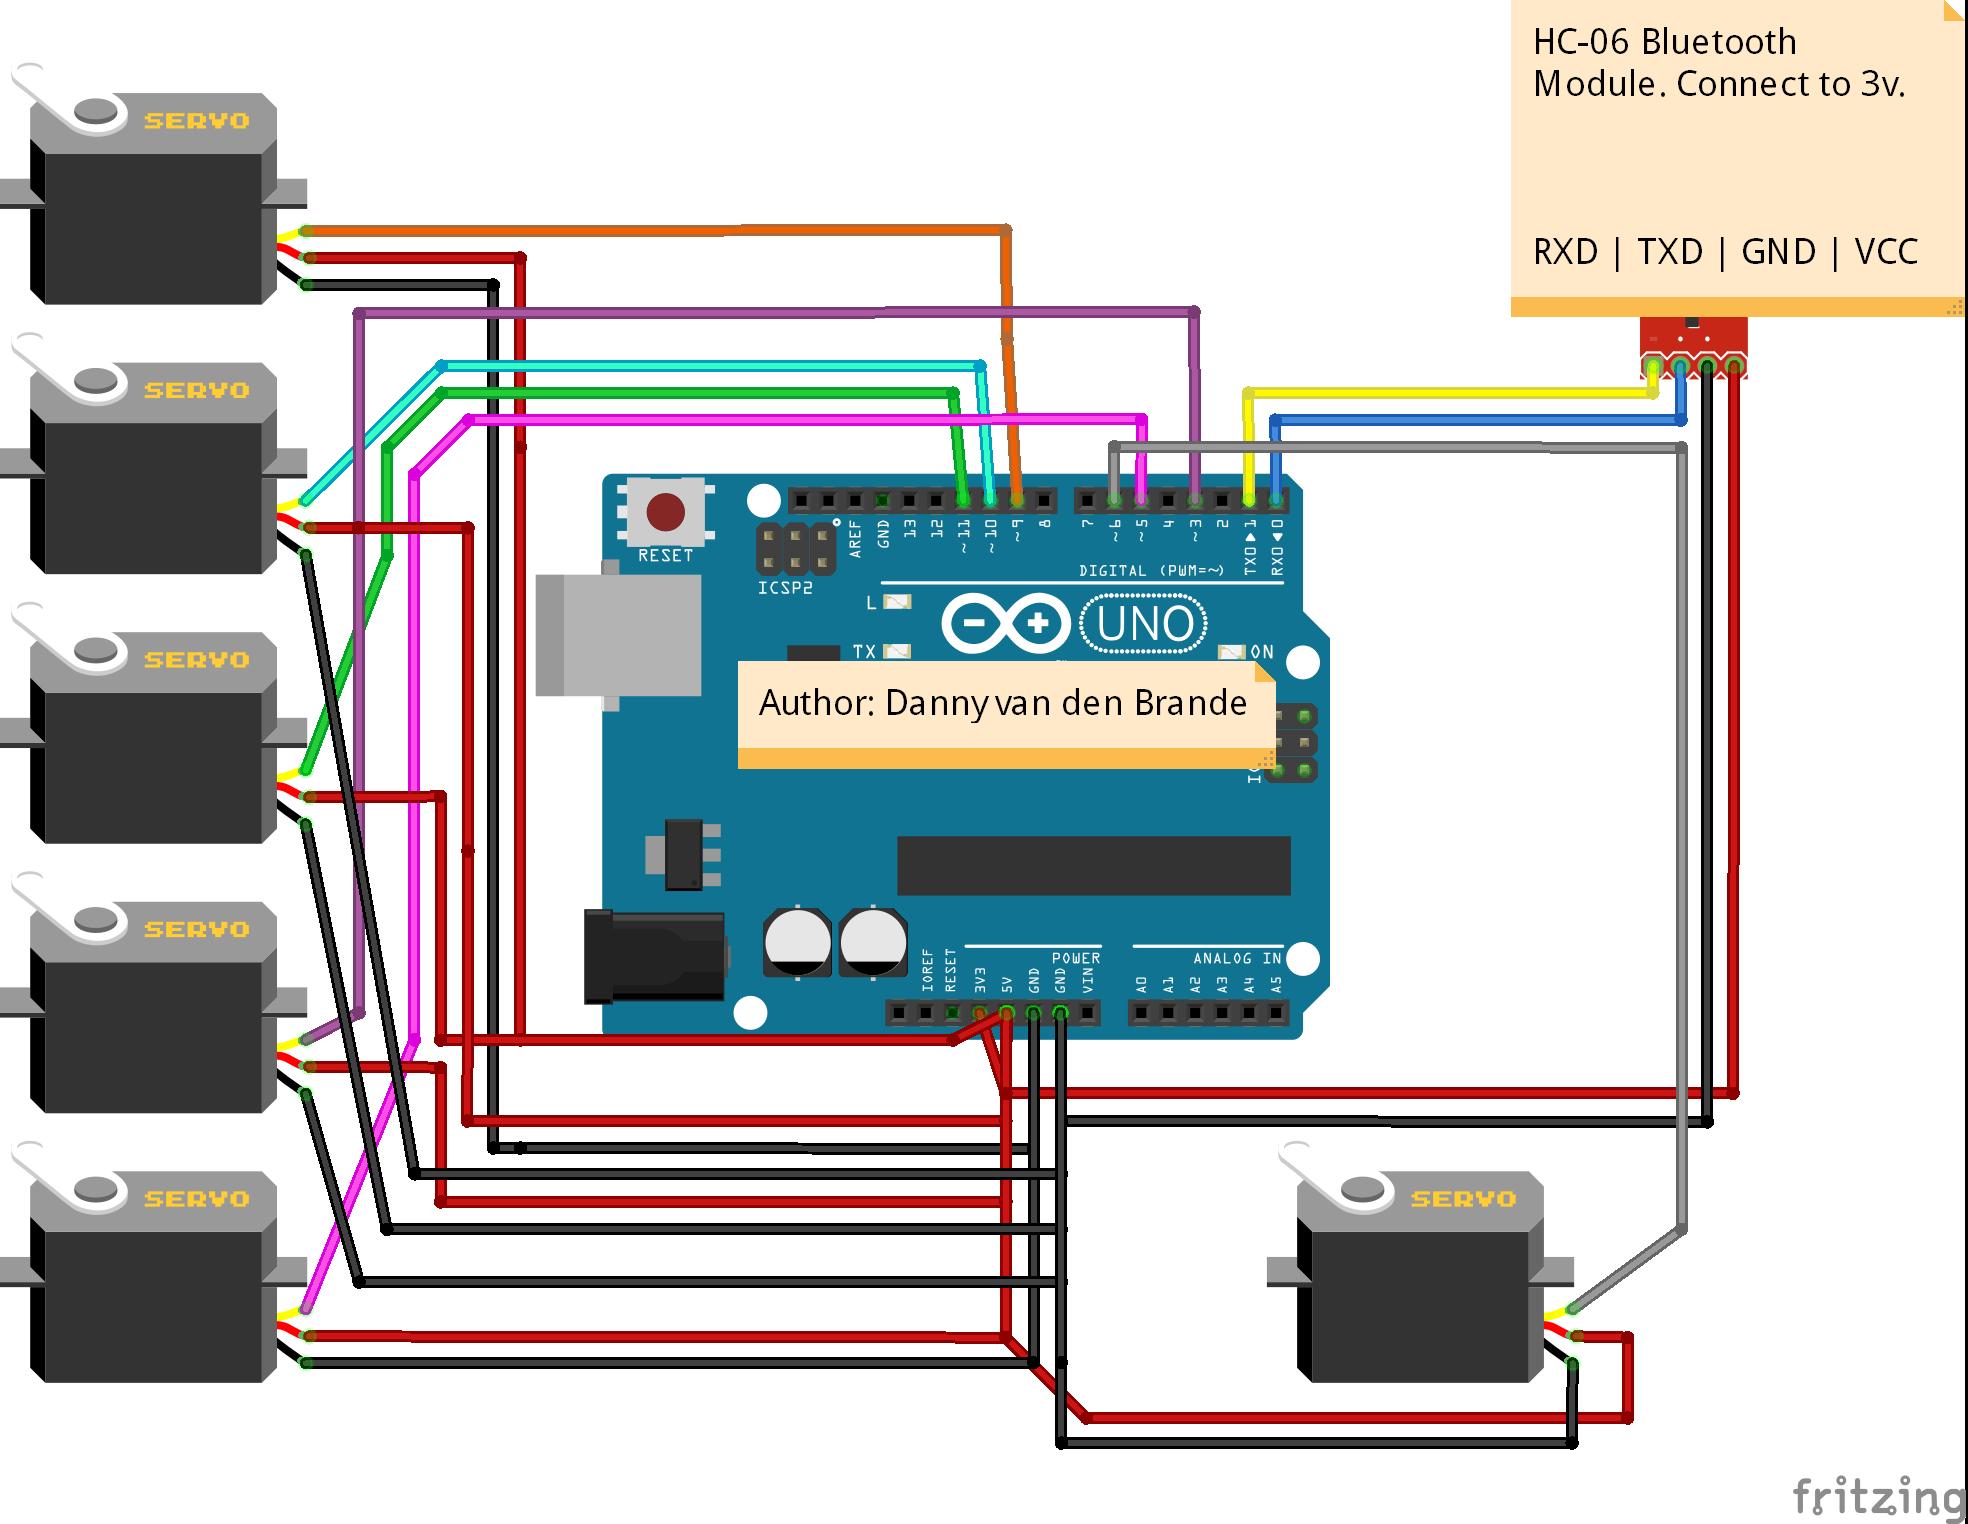 BLUETOOTH Servo motor Control Multi_bb?auto=compress%2Cformat&w=400&h=300&fit=min temperature sensor to control servo motor arduino project hub